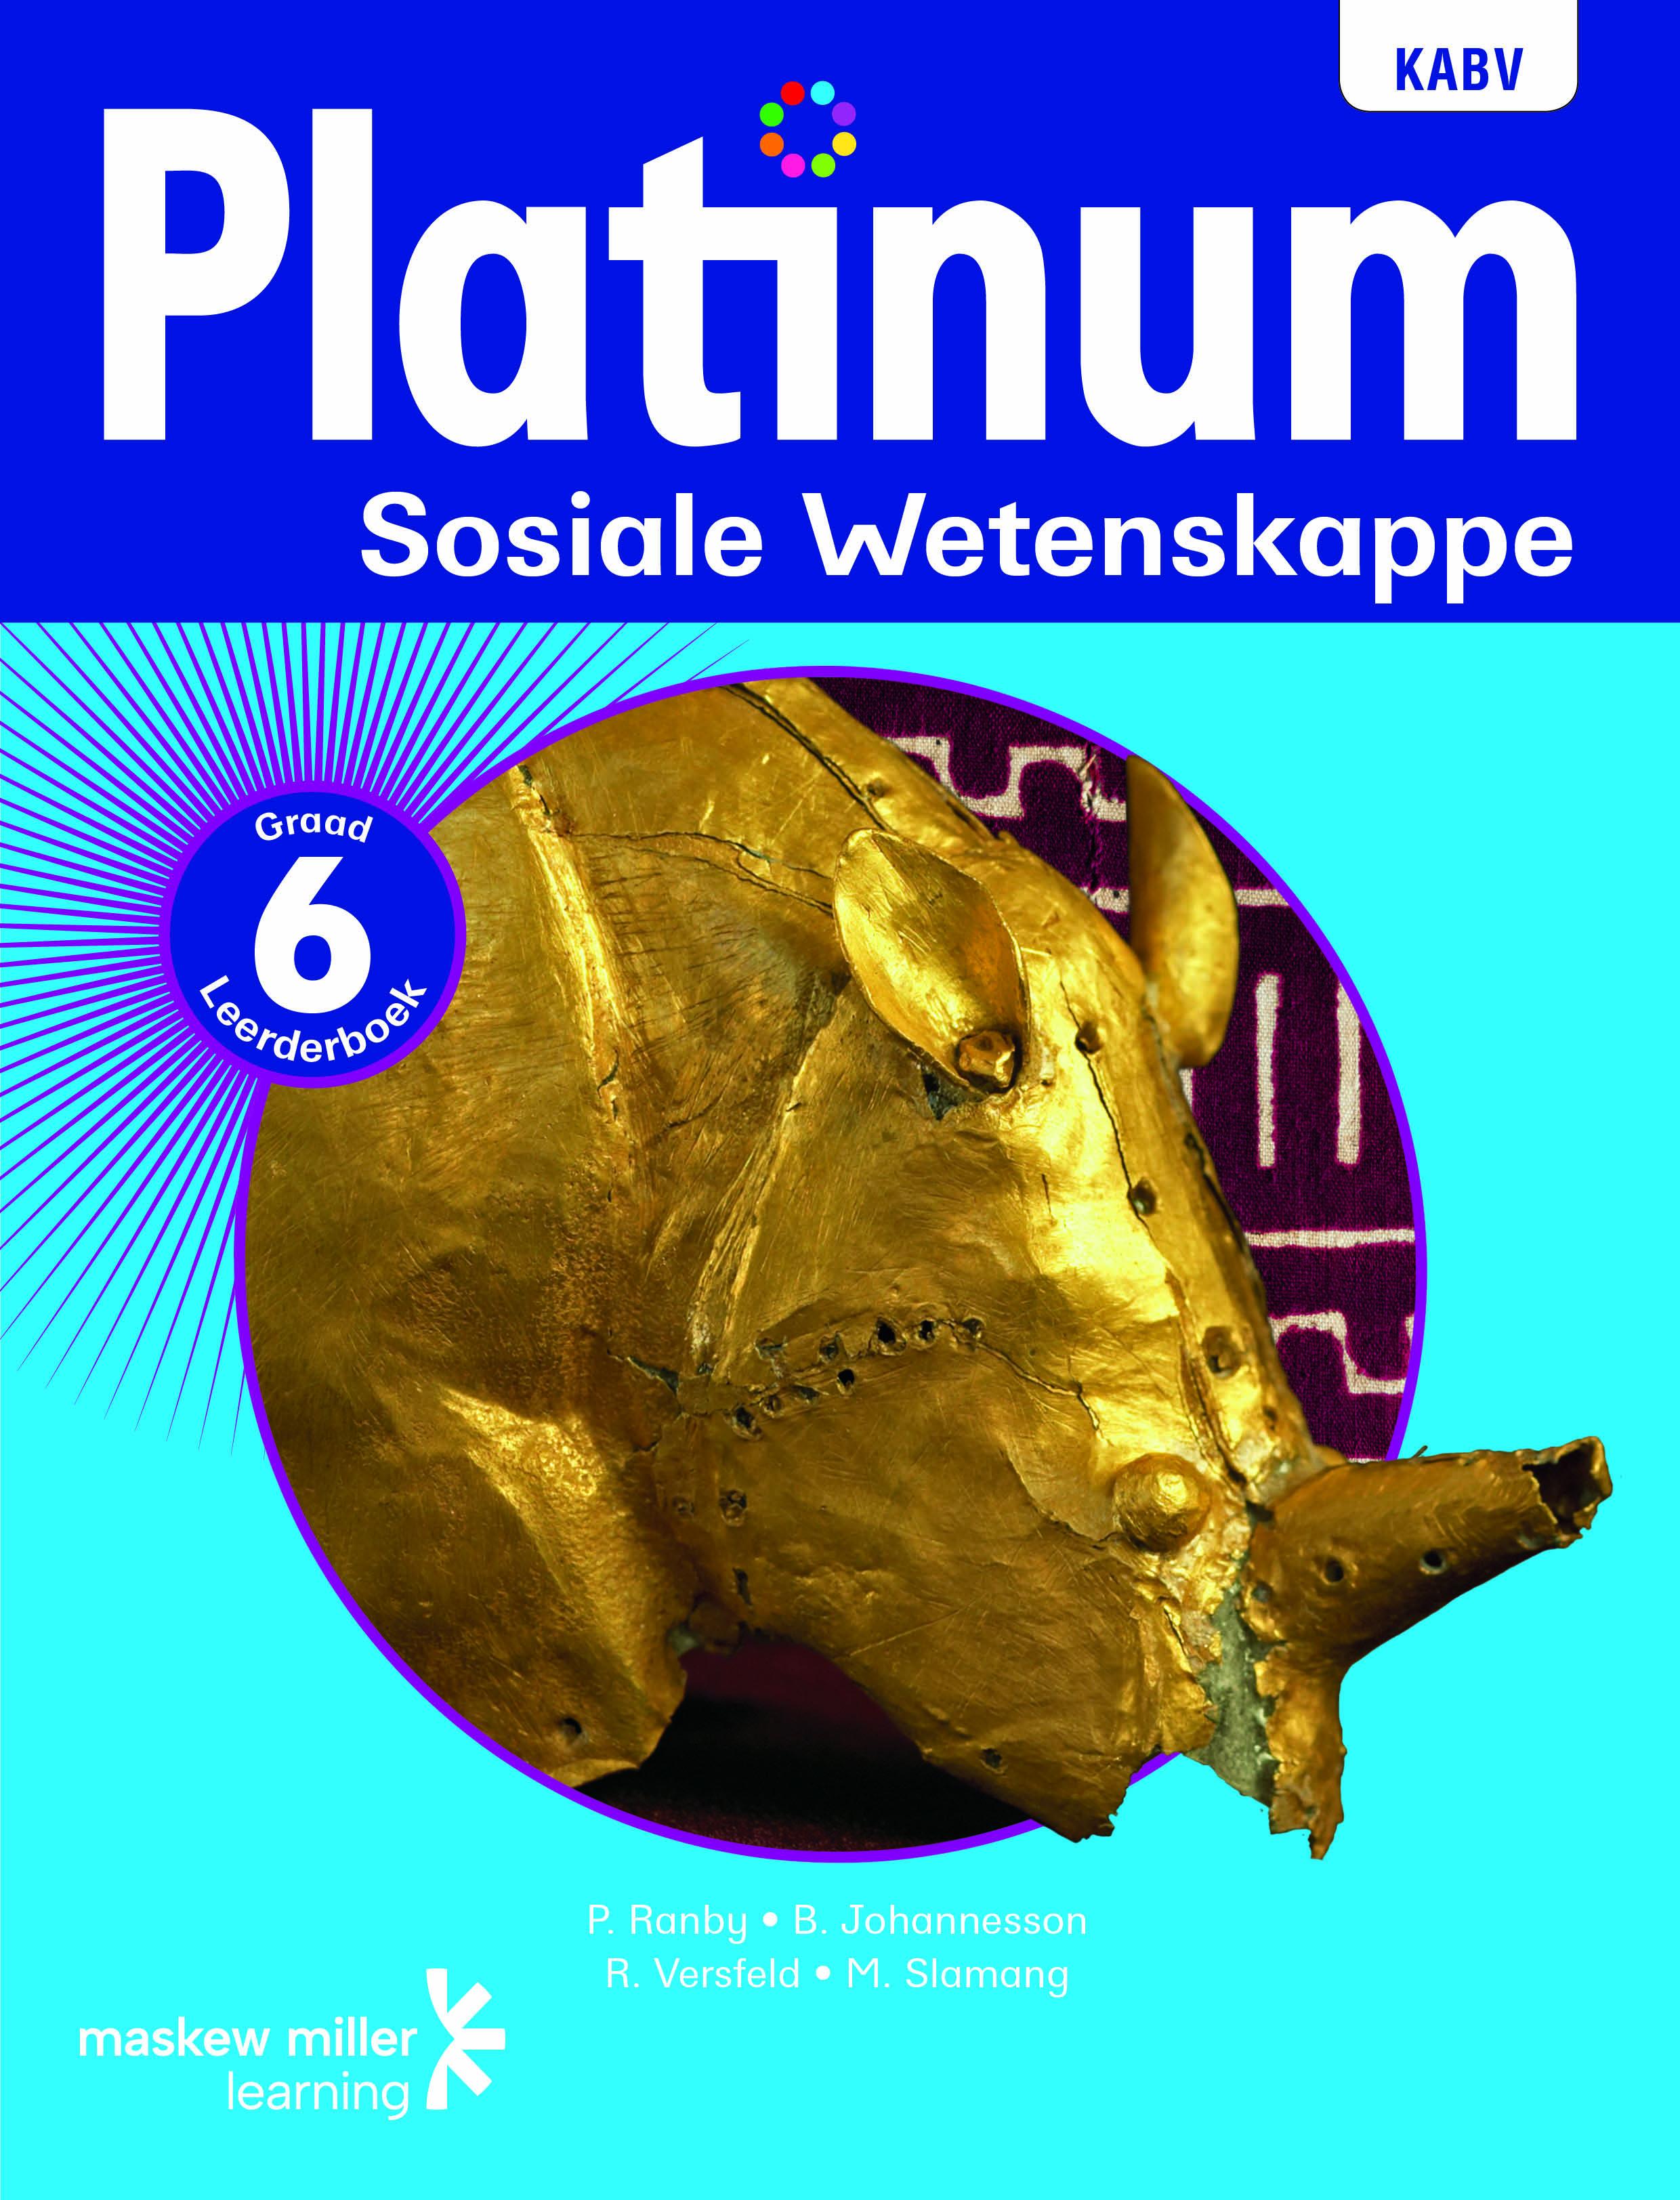 Picture of Platinum sosiale wetenskappe NKABV